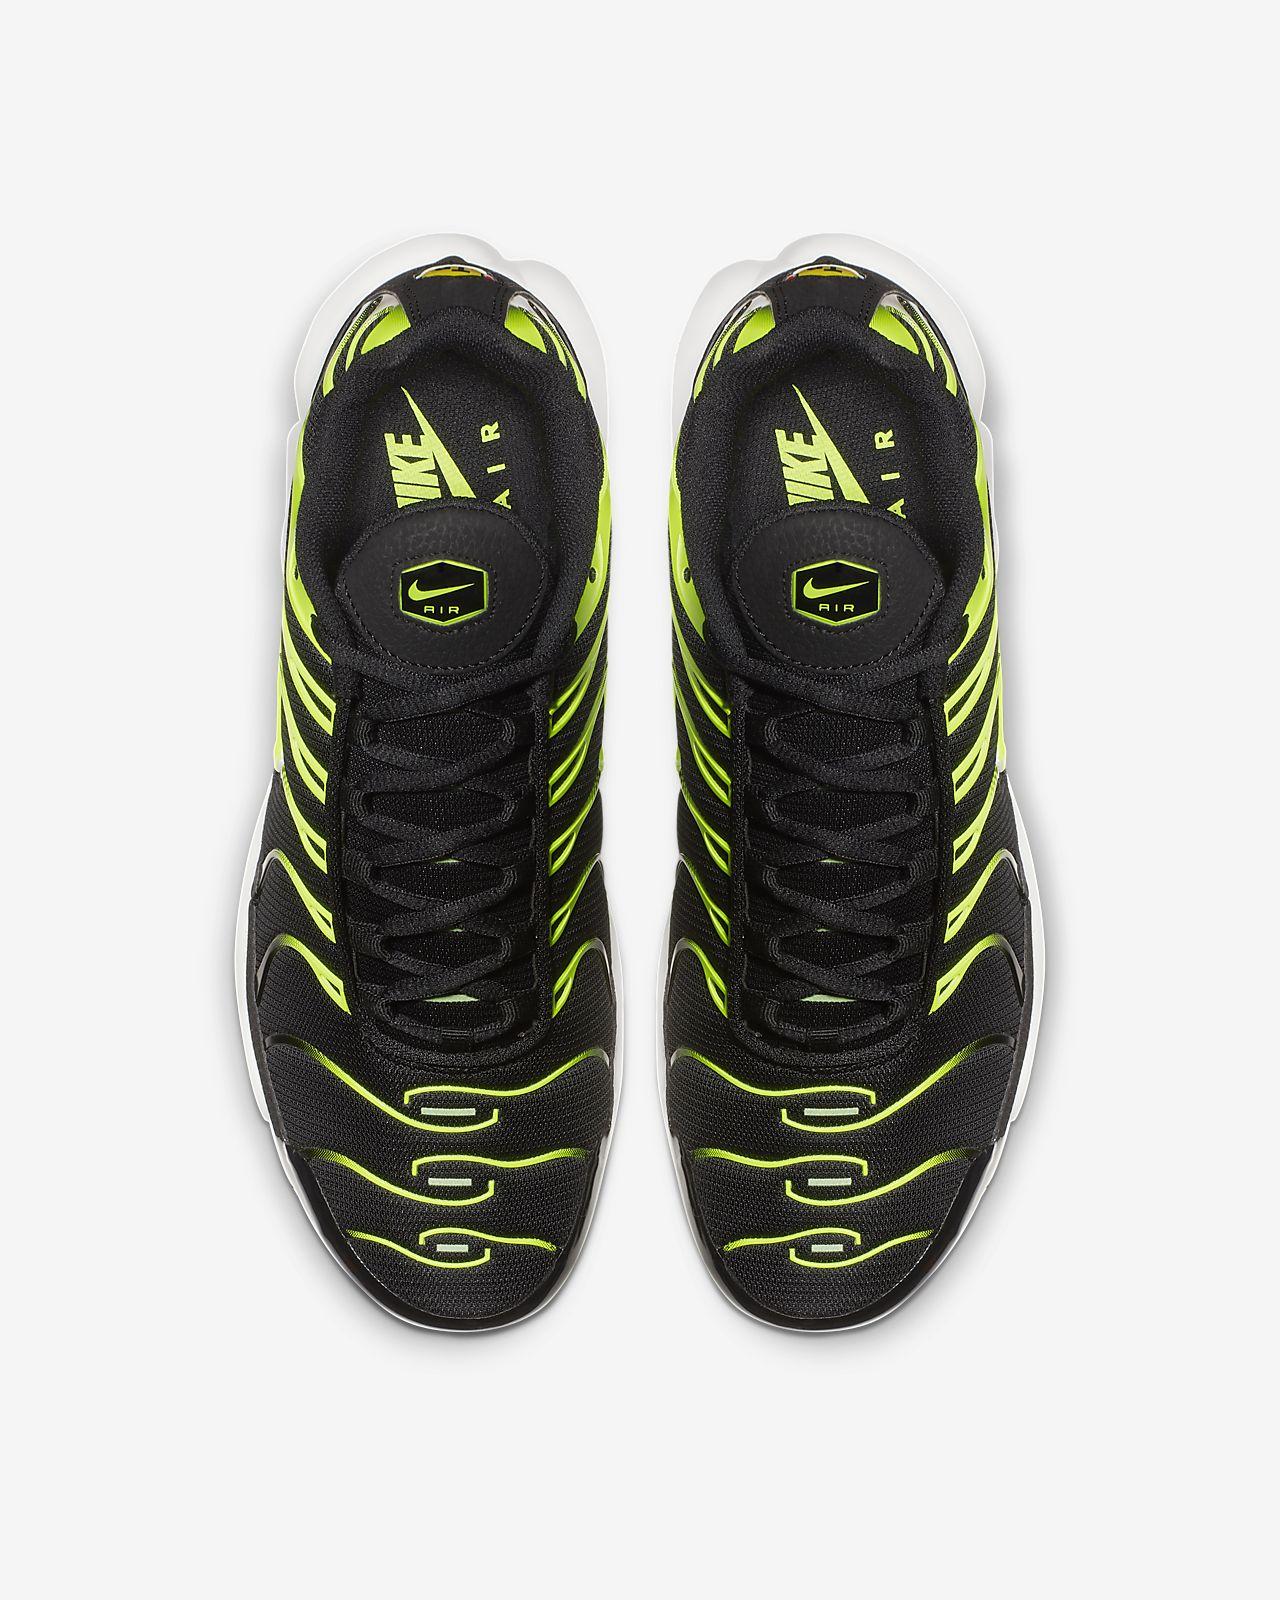 4384c2b0d1c4 Nike Air Max Plus Men s Shoe. Nike.com GB